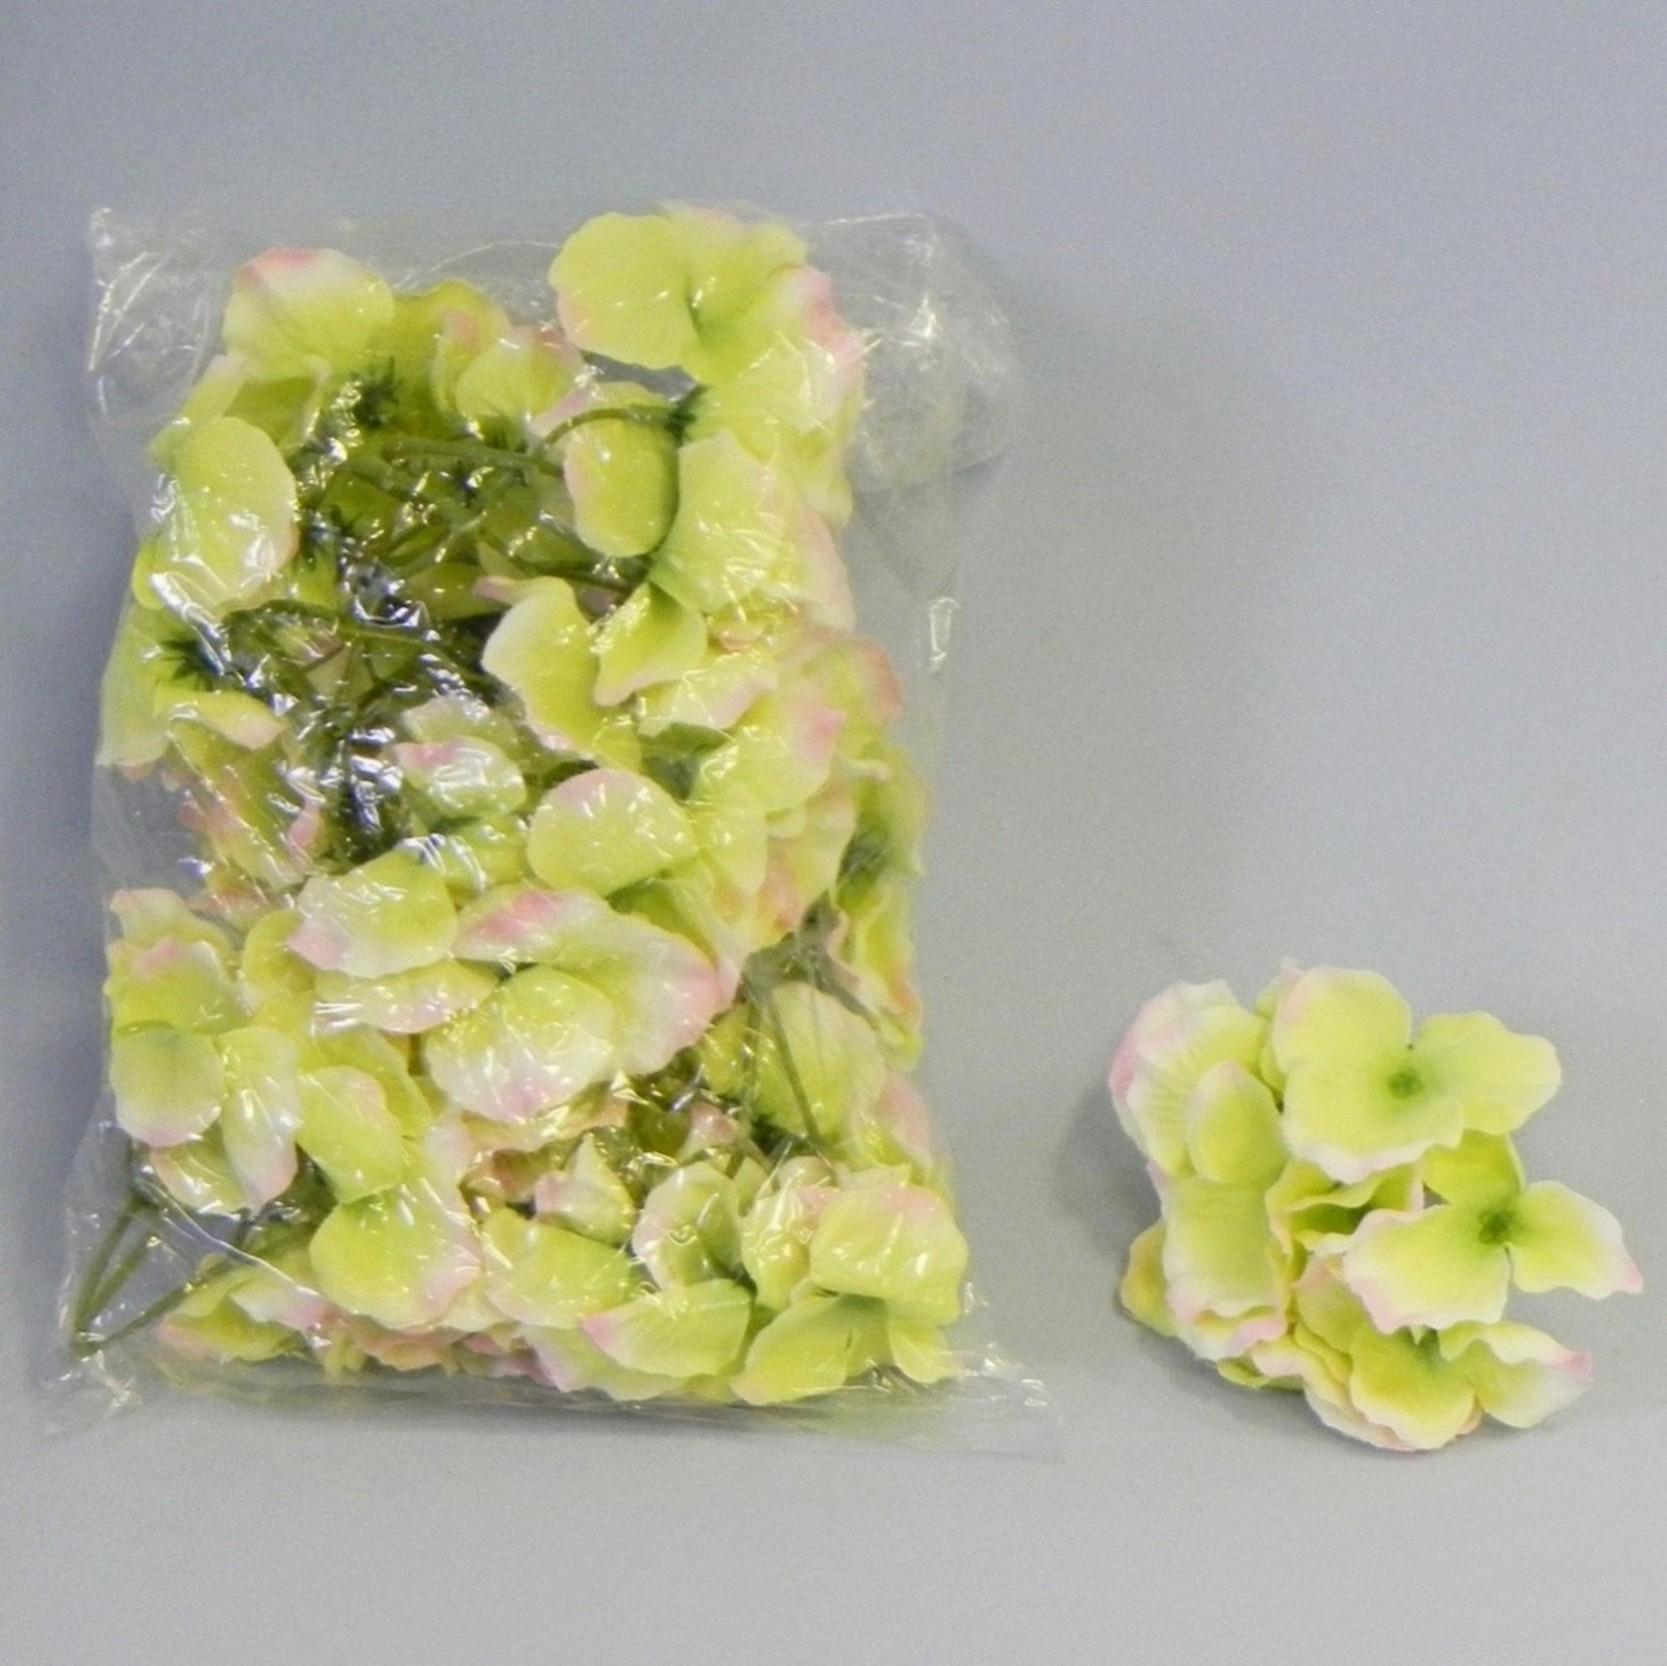 KLIA Umělý květ hortenzie 12ks Barva: žluto-zelená